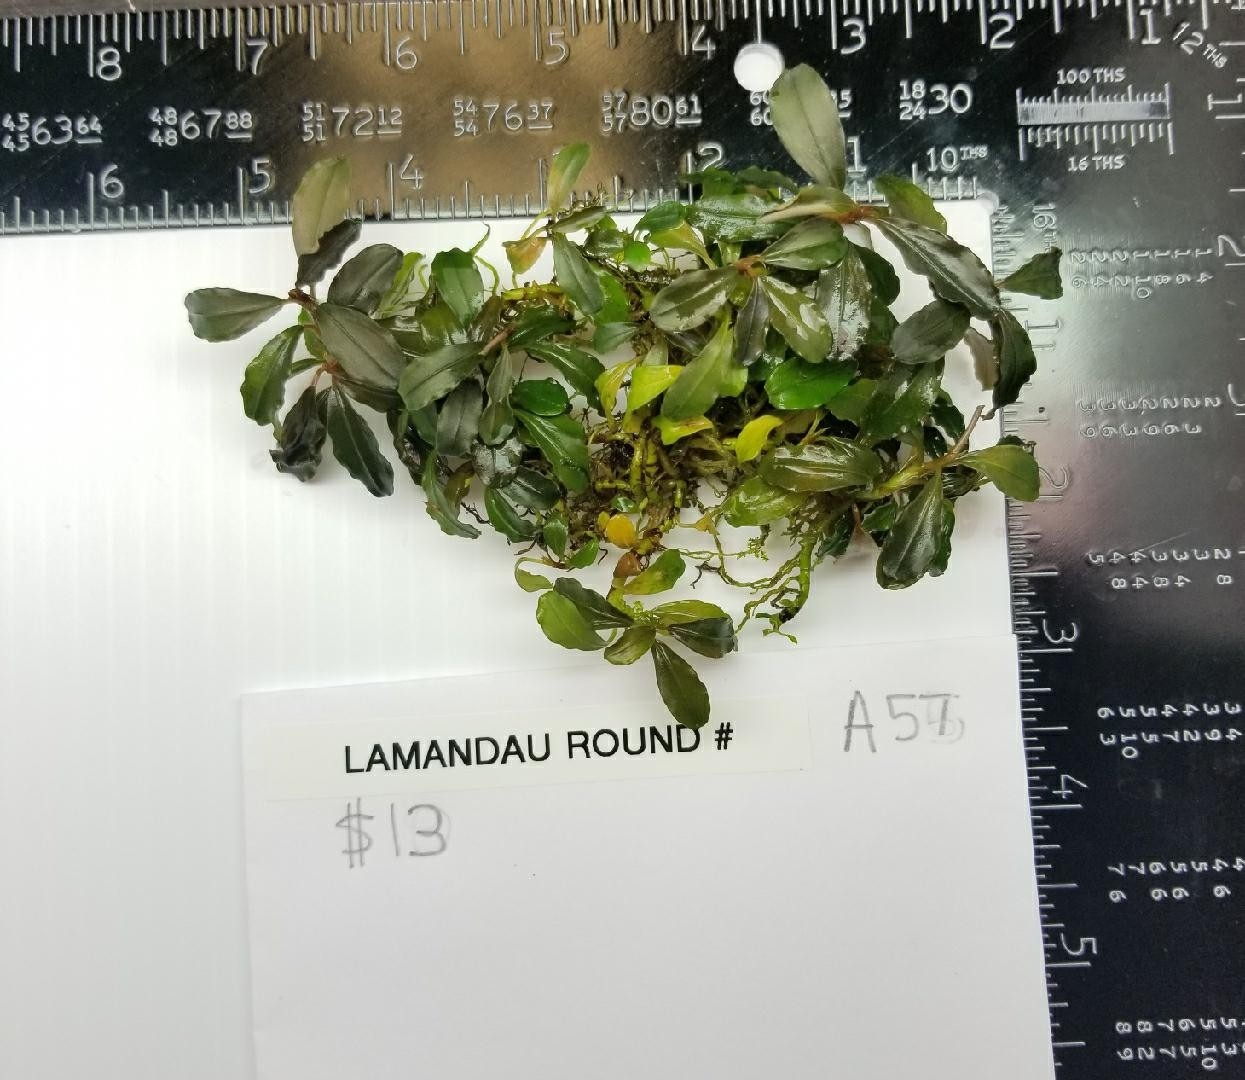 Lamandau Round Buce - A57